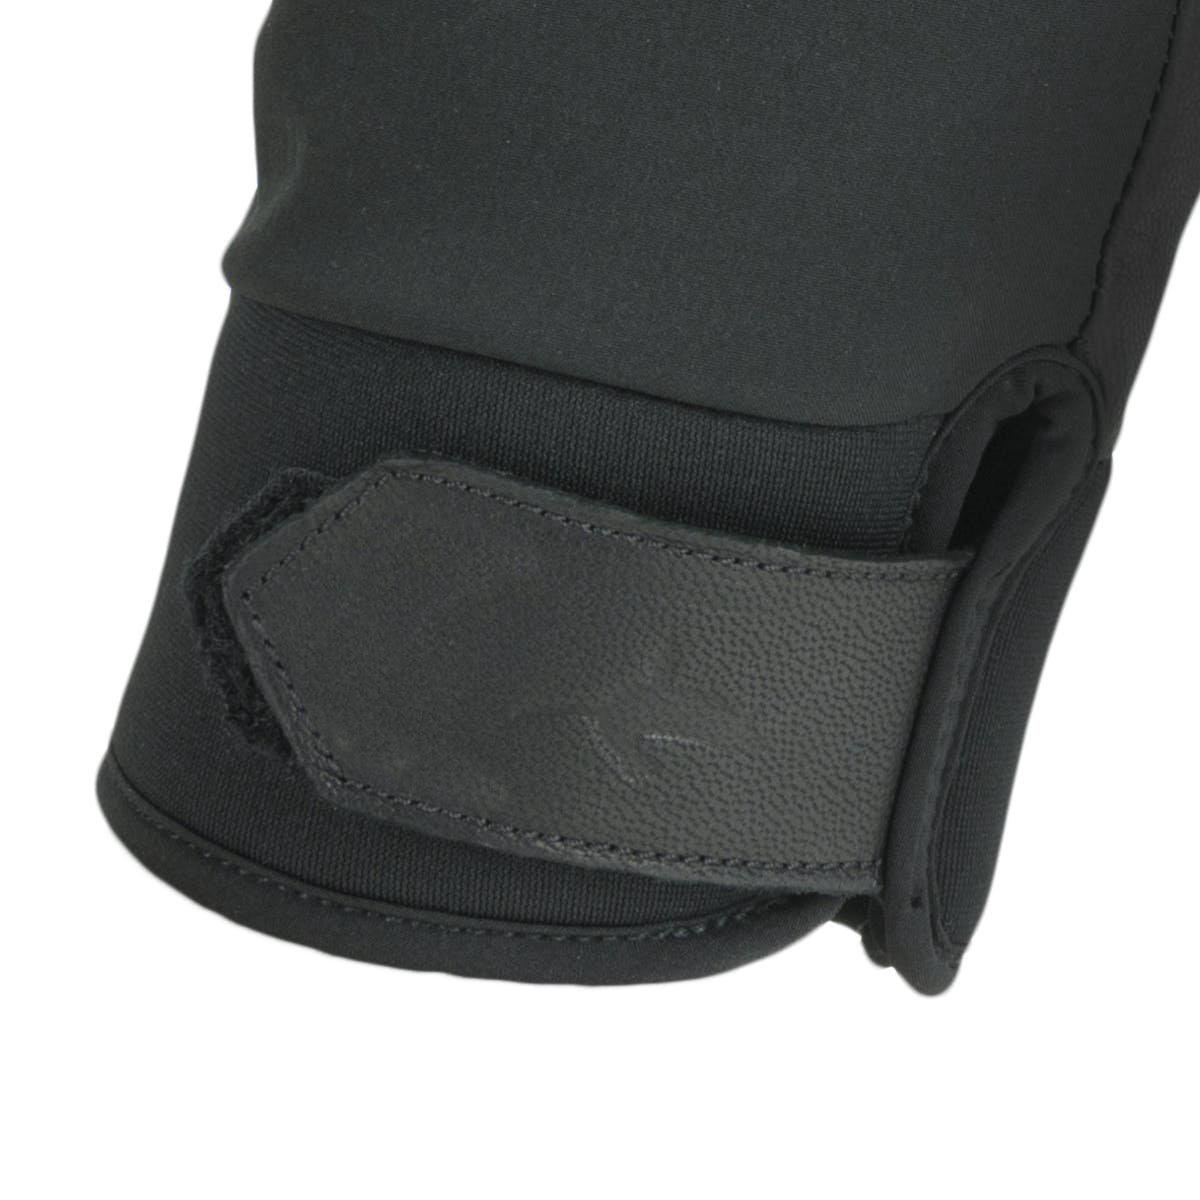 Sealskinz Women's Waterproof All Weather Insulated Glove – Black